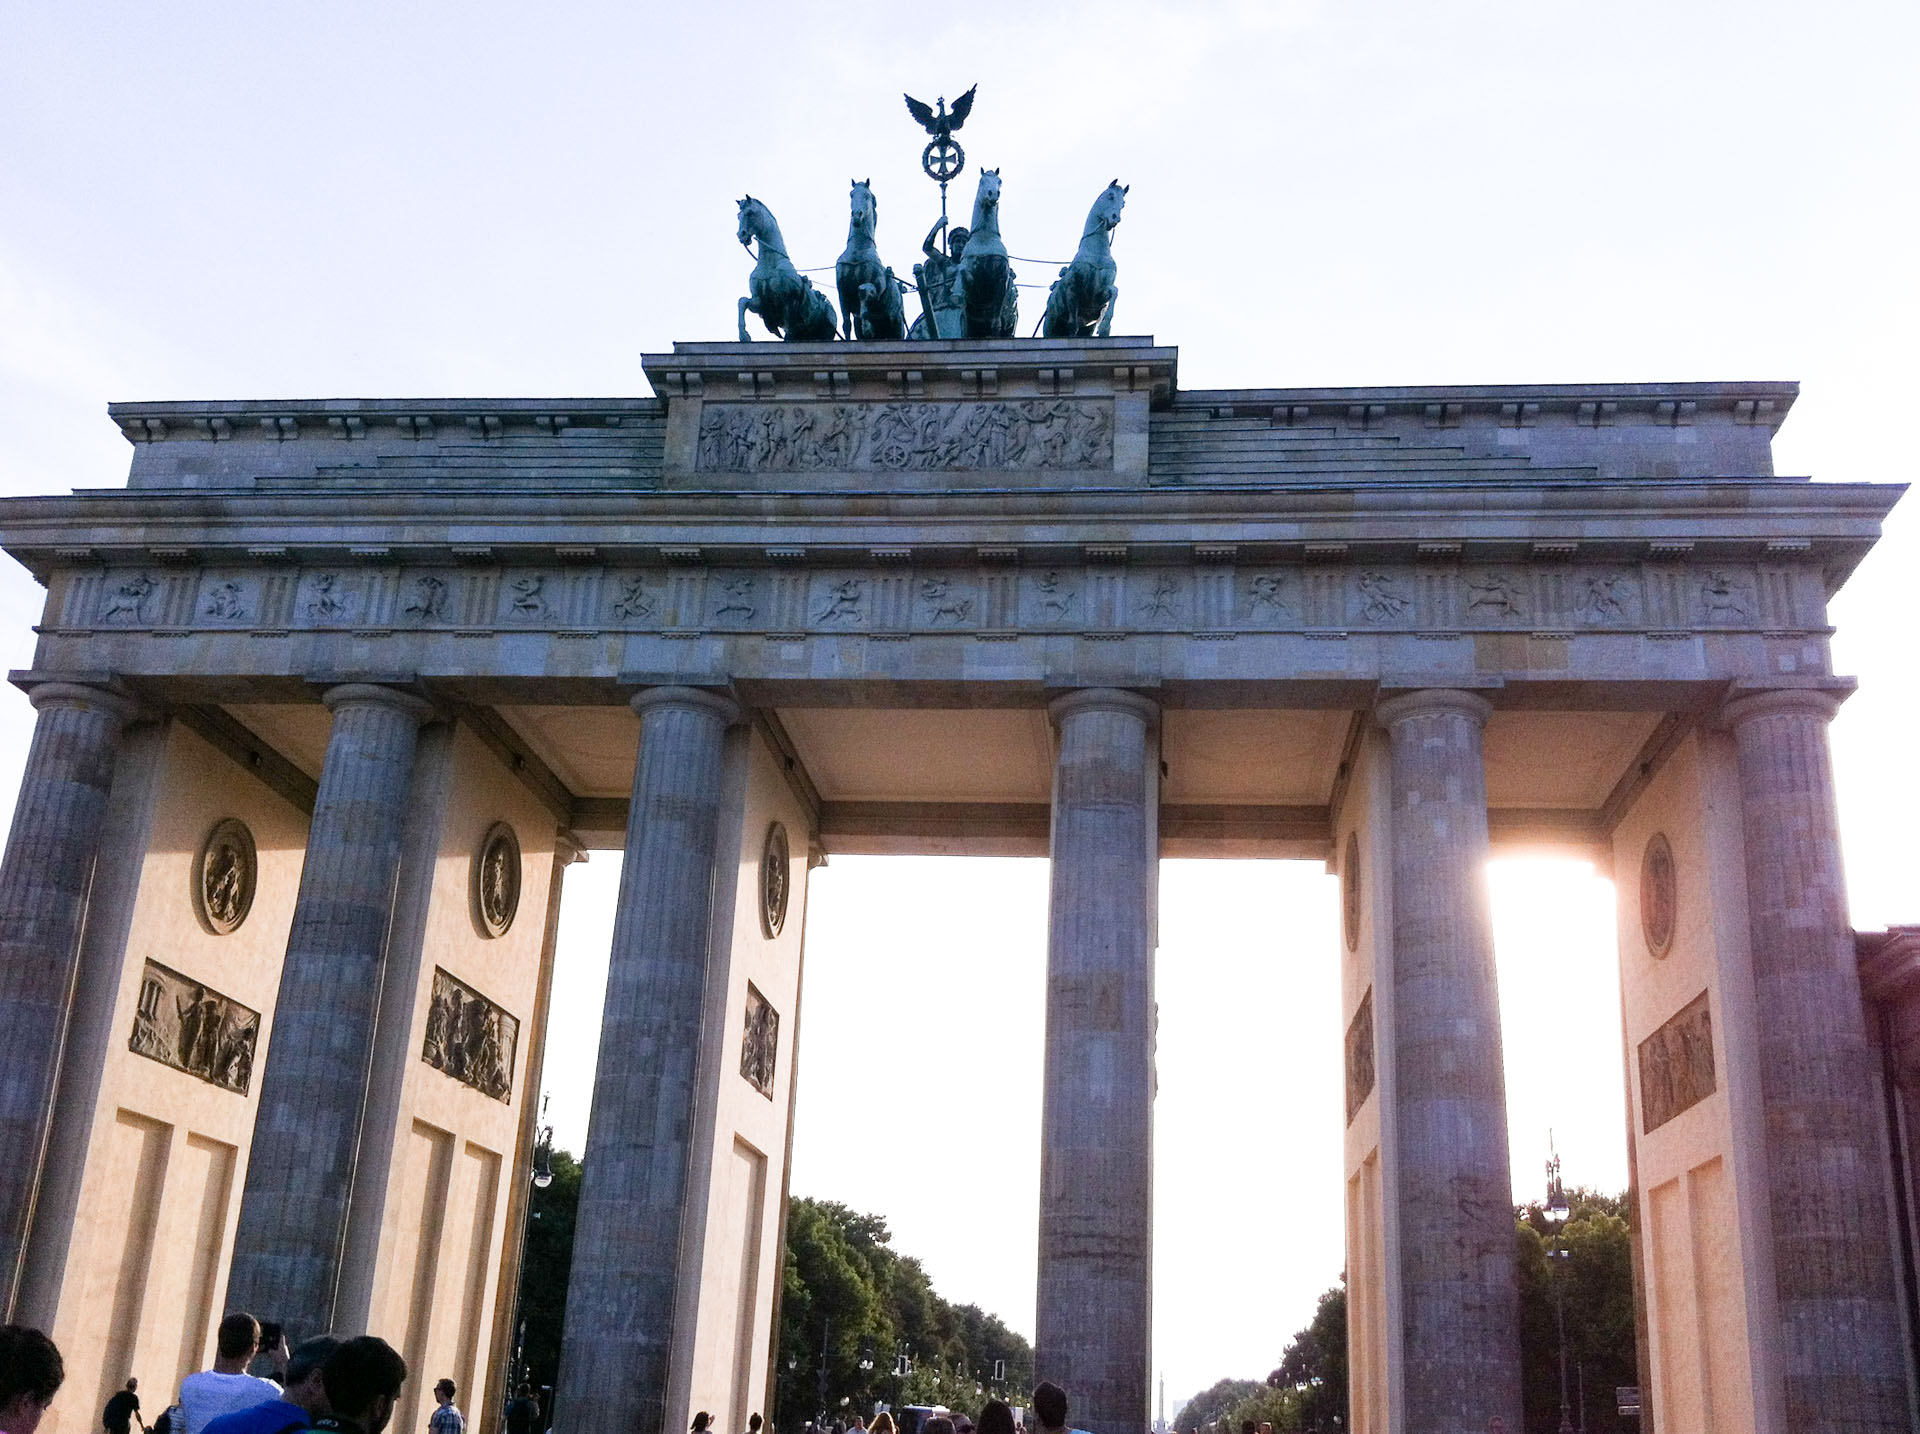 Berlino senza glutine gluten free travel and living - Porta di berlino ...